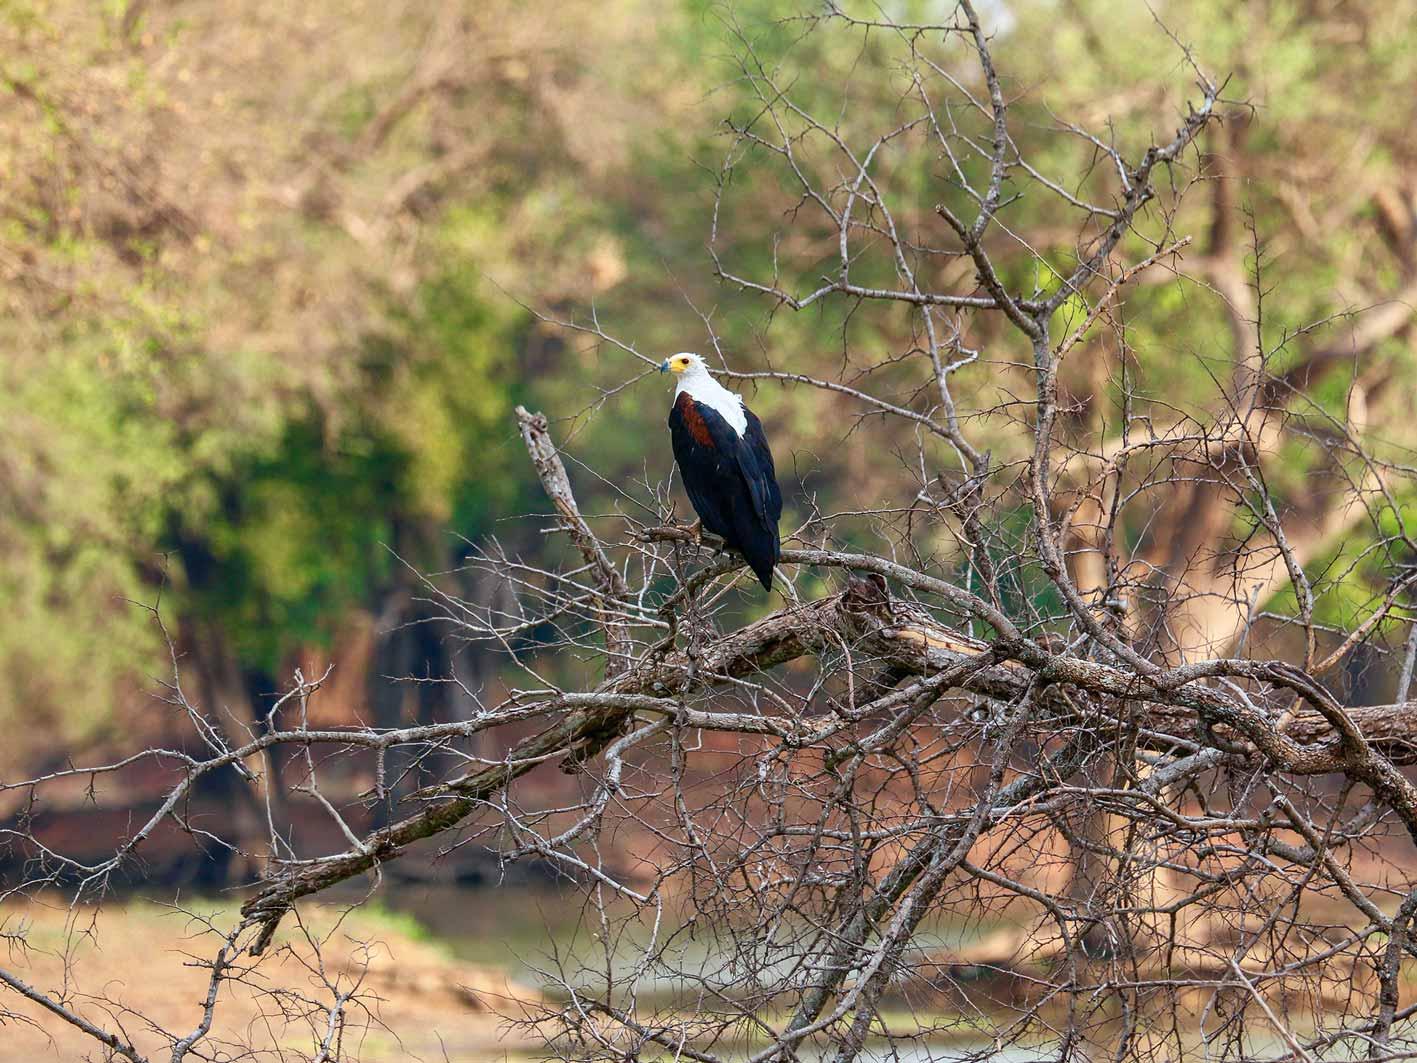 African Fish Eagle, Schreiseeadler, Zambia-Safari